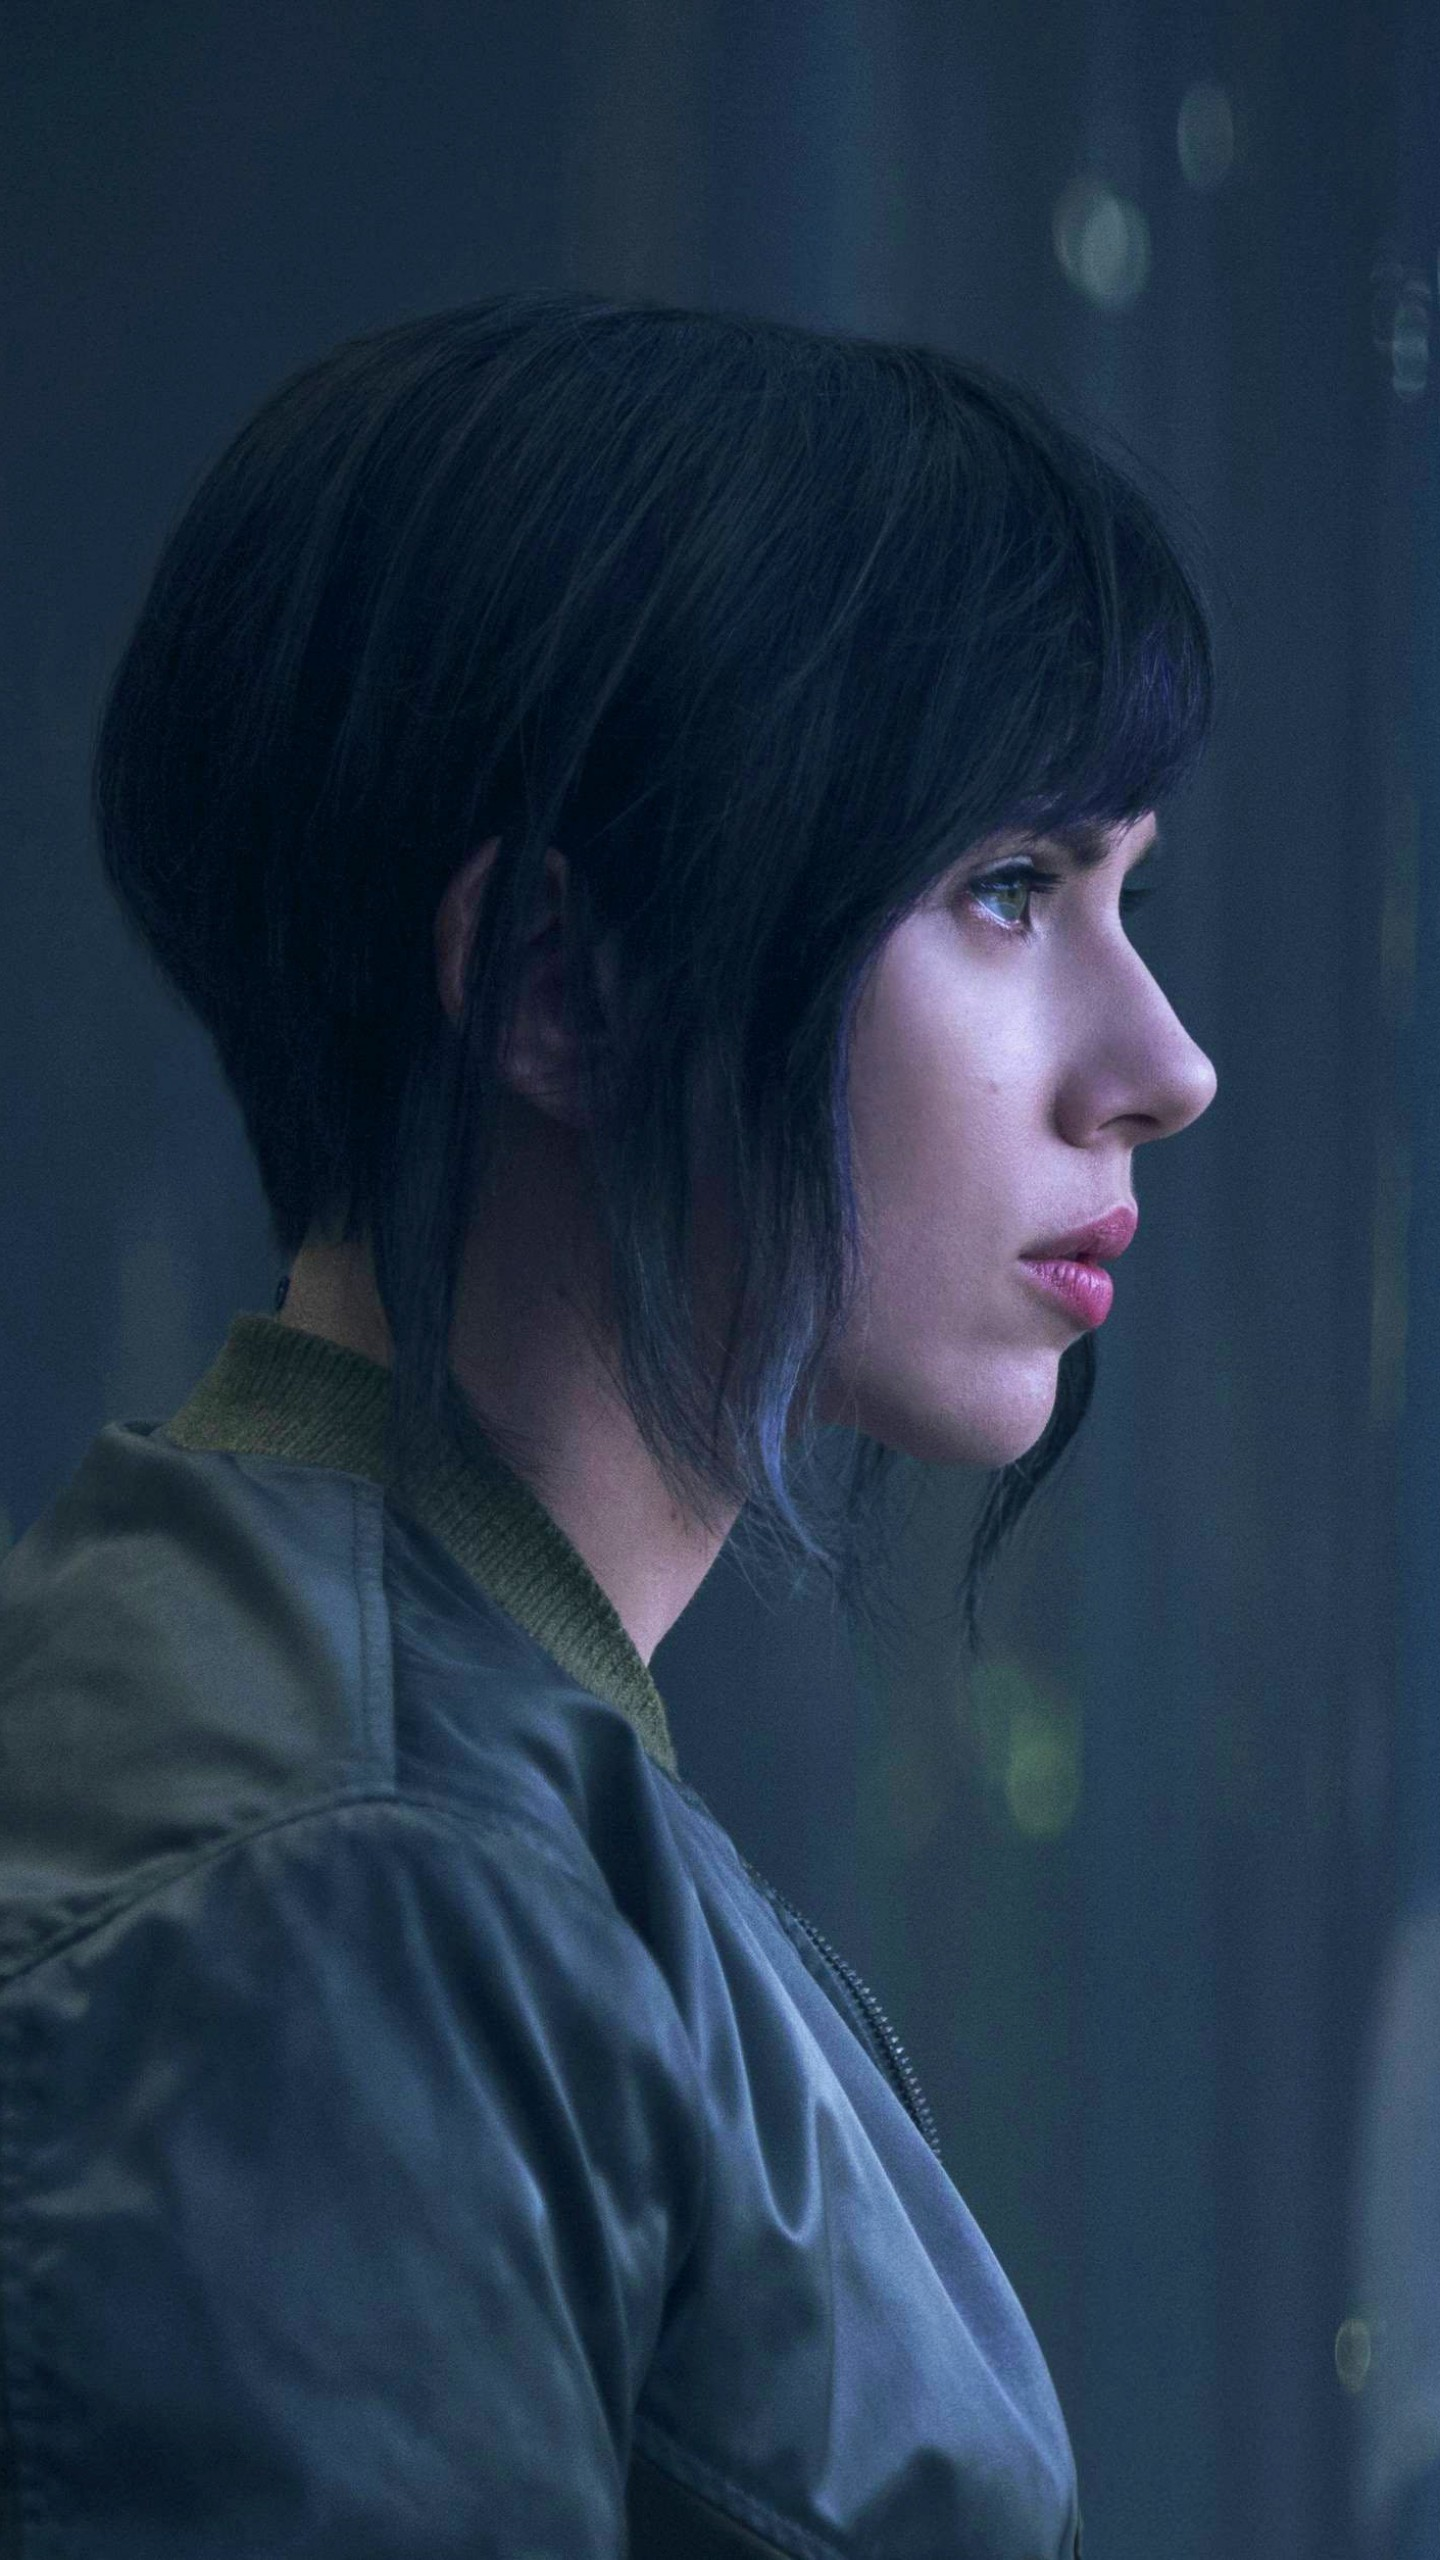 Wallpaper Ghost In The Shell Scarlett Johansson Movies 10563